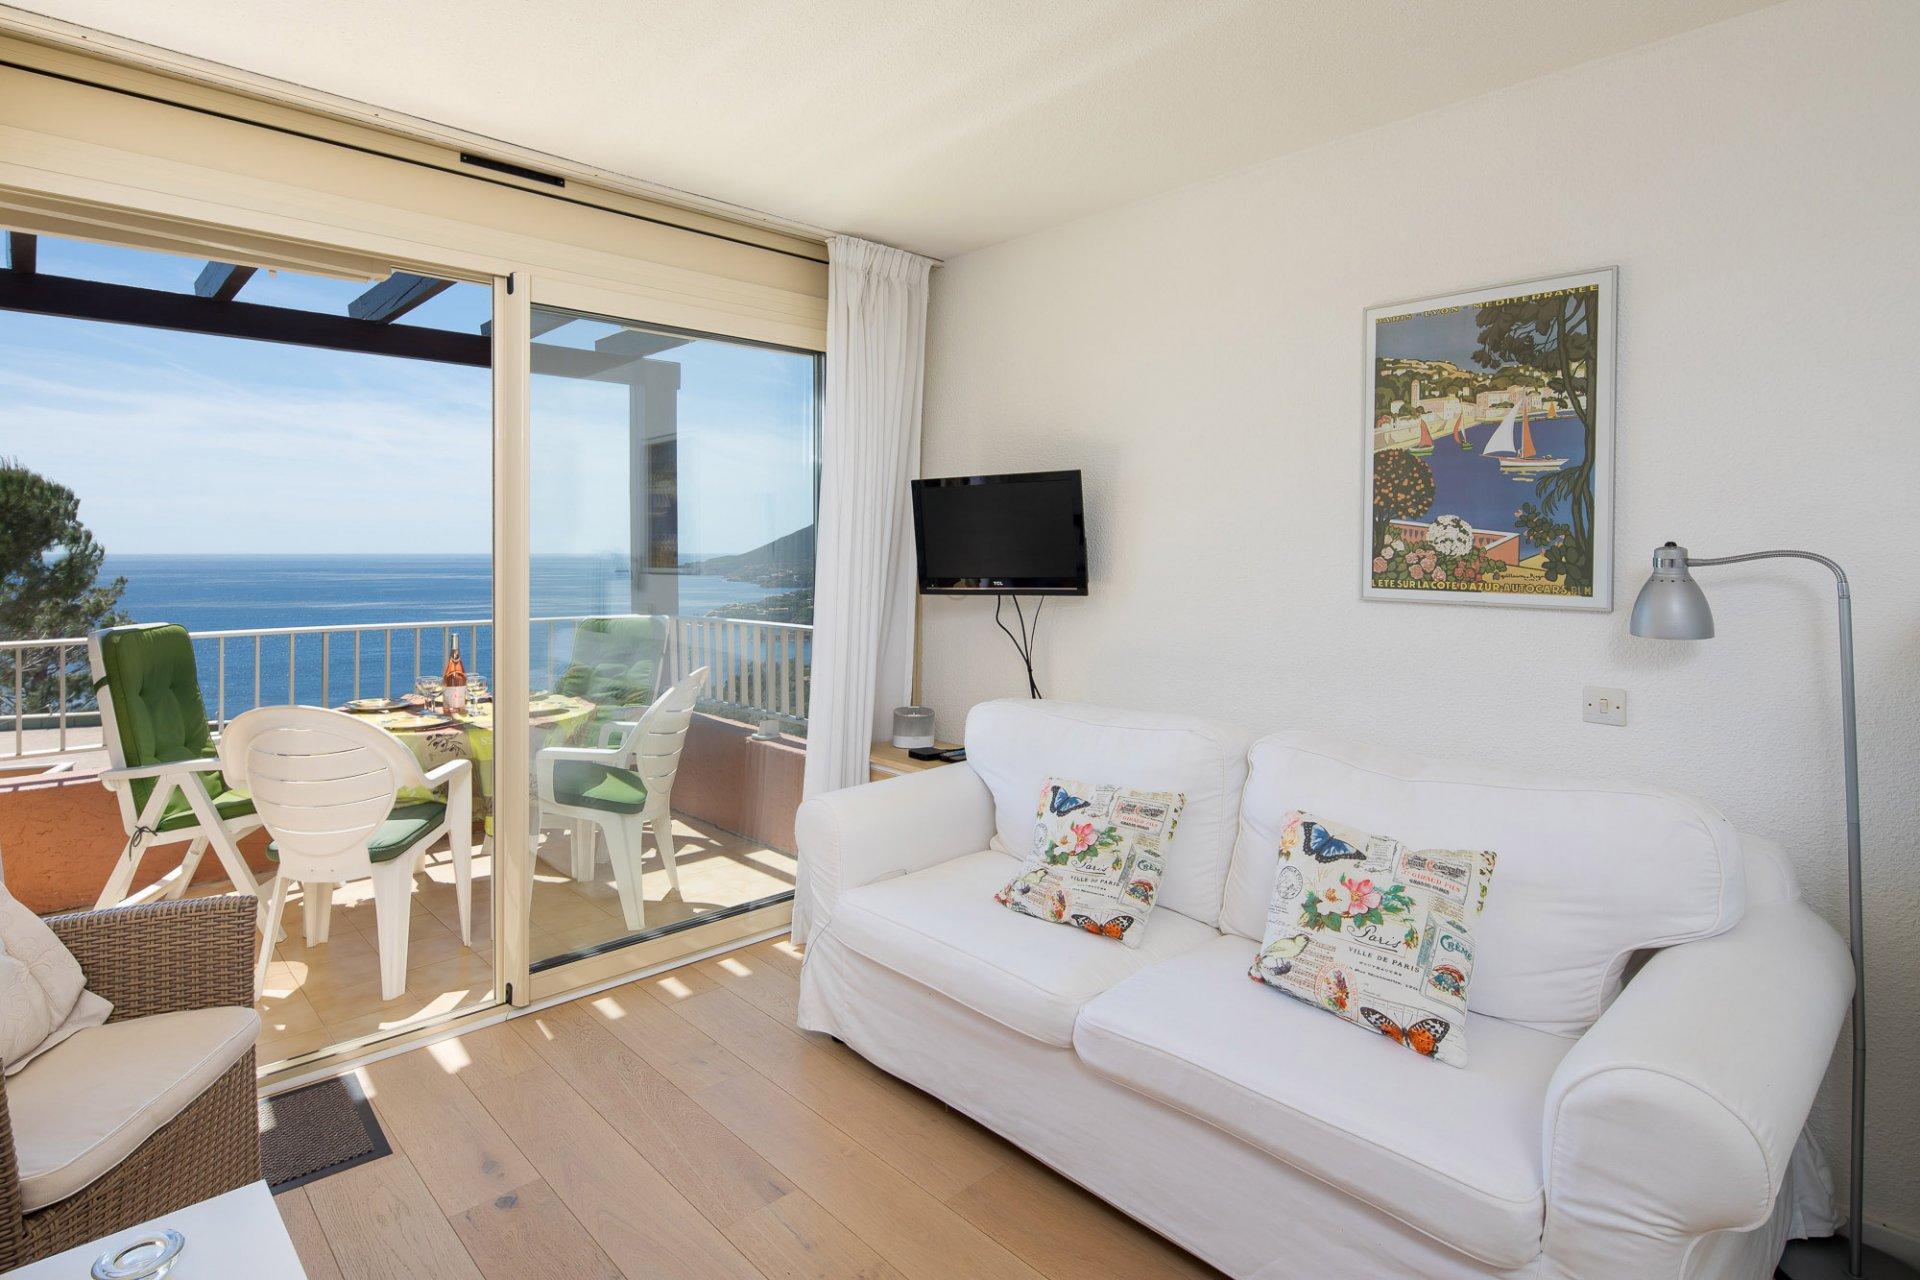 Verkoop Appartement - Théoule-sur-Mer